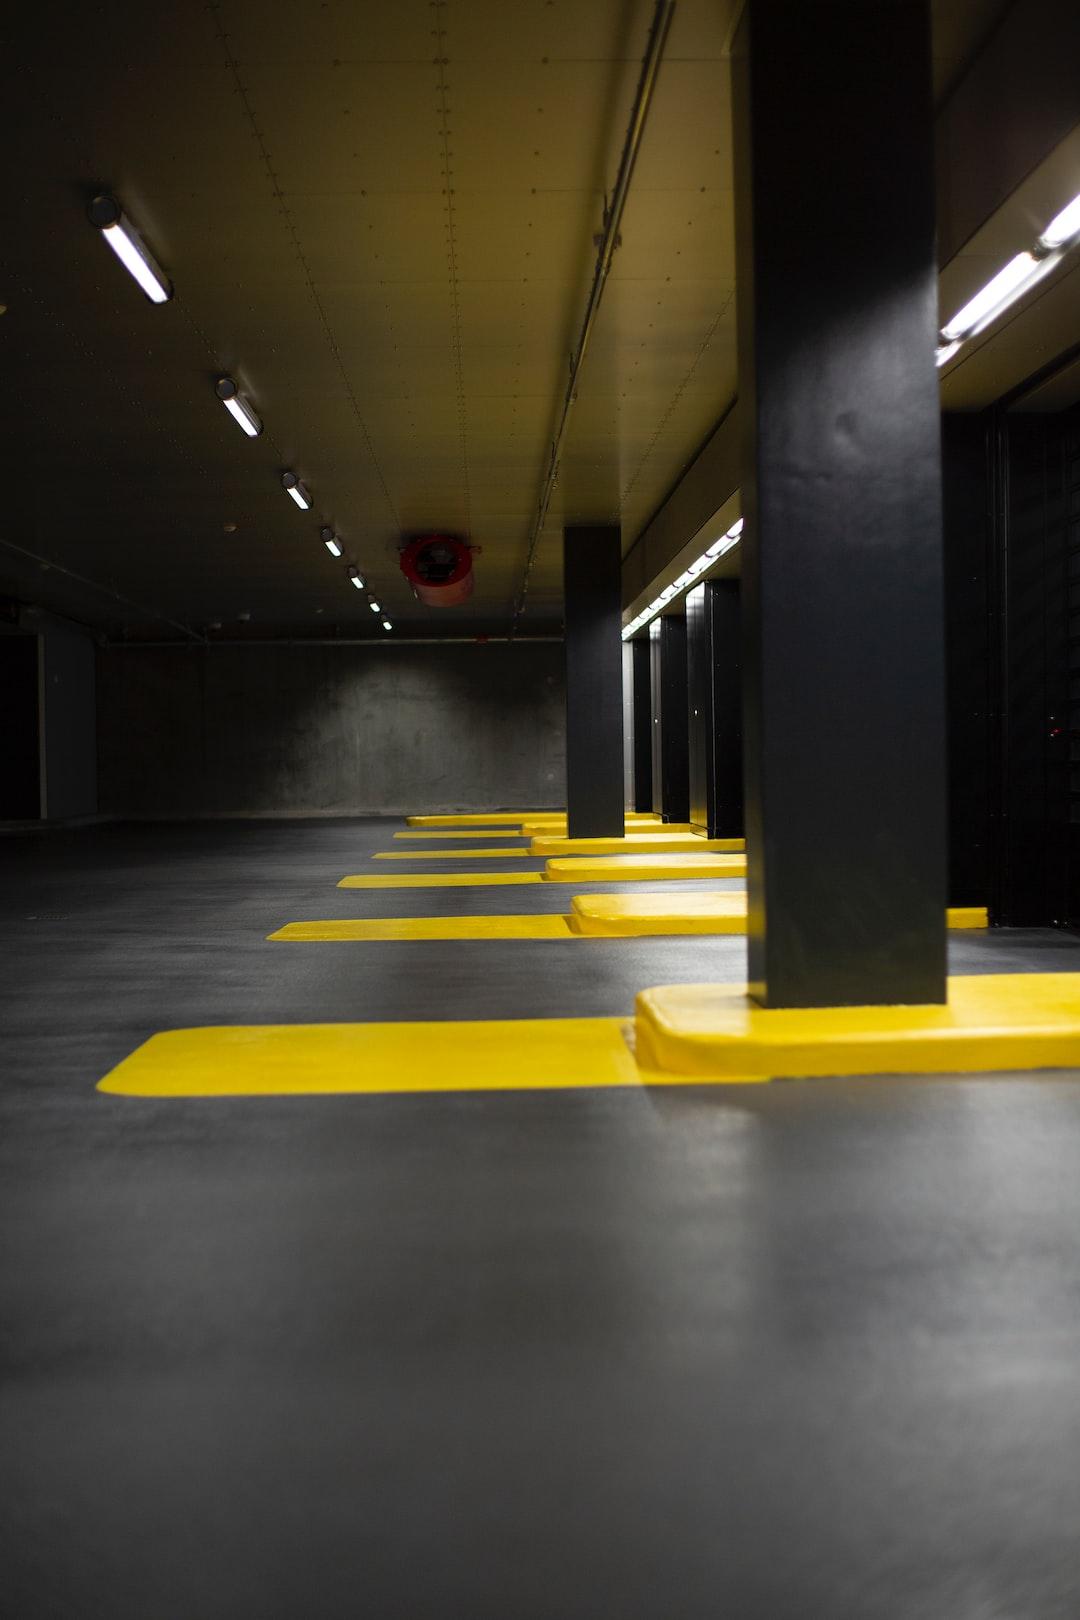 Epoxy Flooring for Garages Information